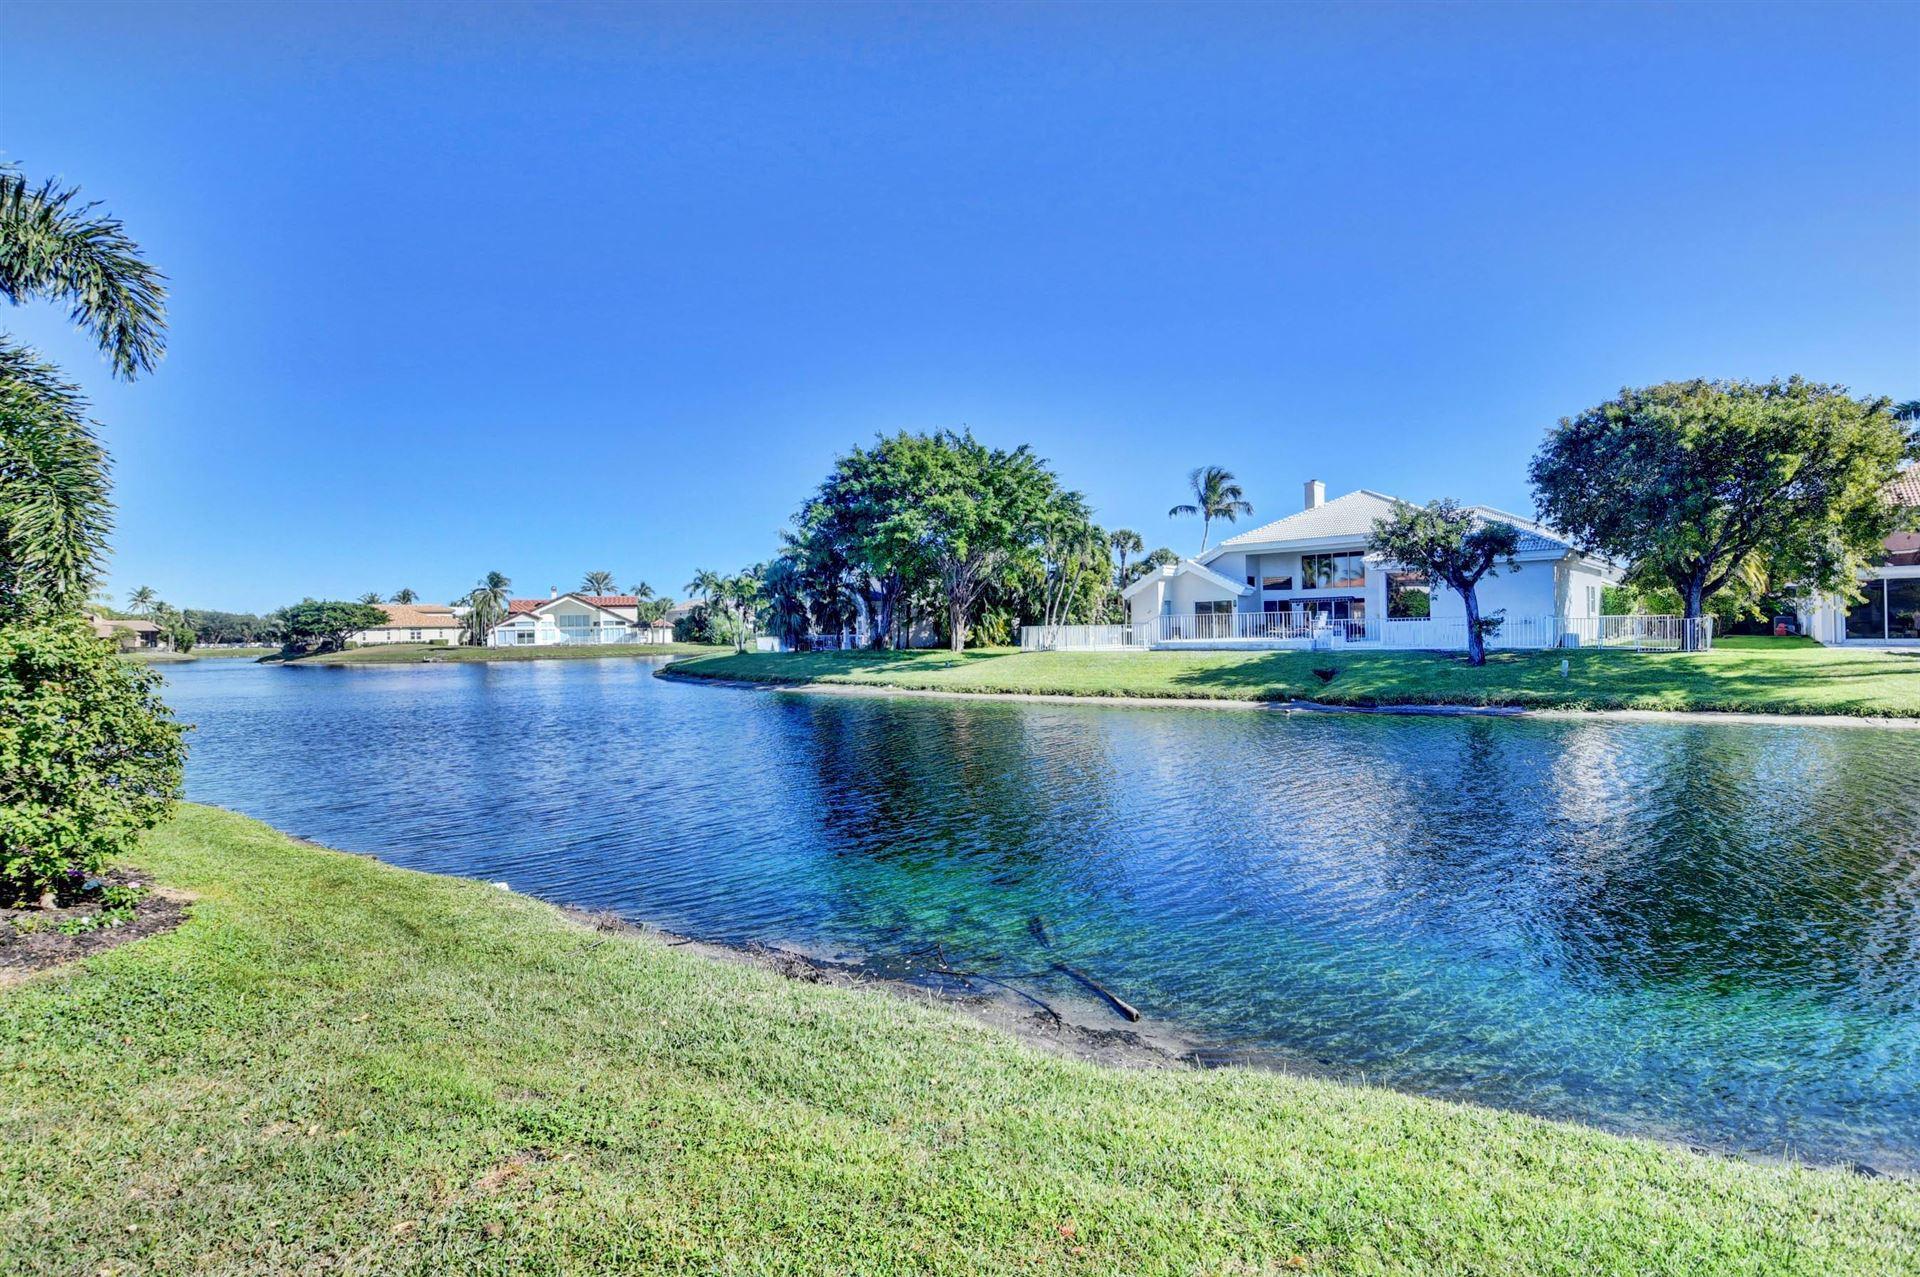 Photo of 6134 NW 31st Avenue, Boca Raton, FL 33496 (MLS # RX-10682366)